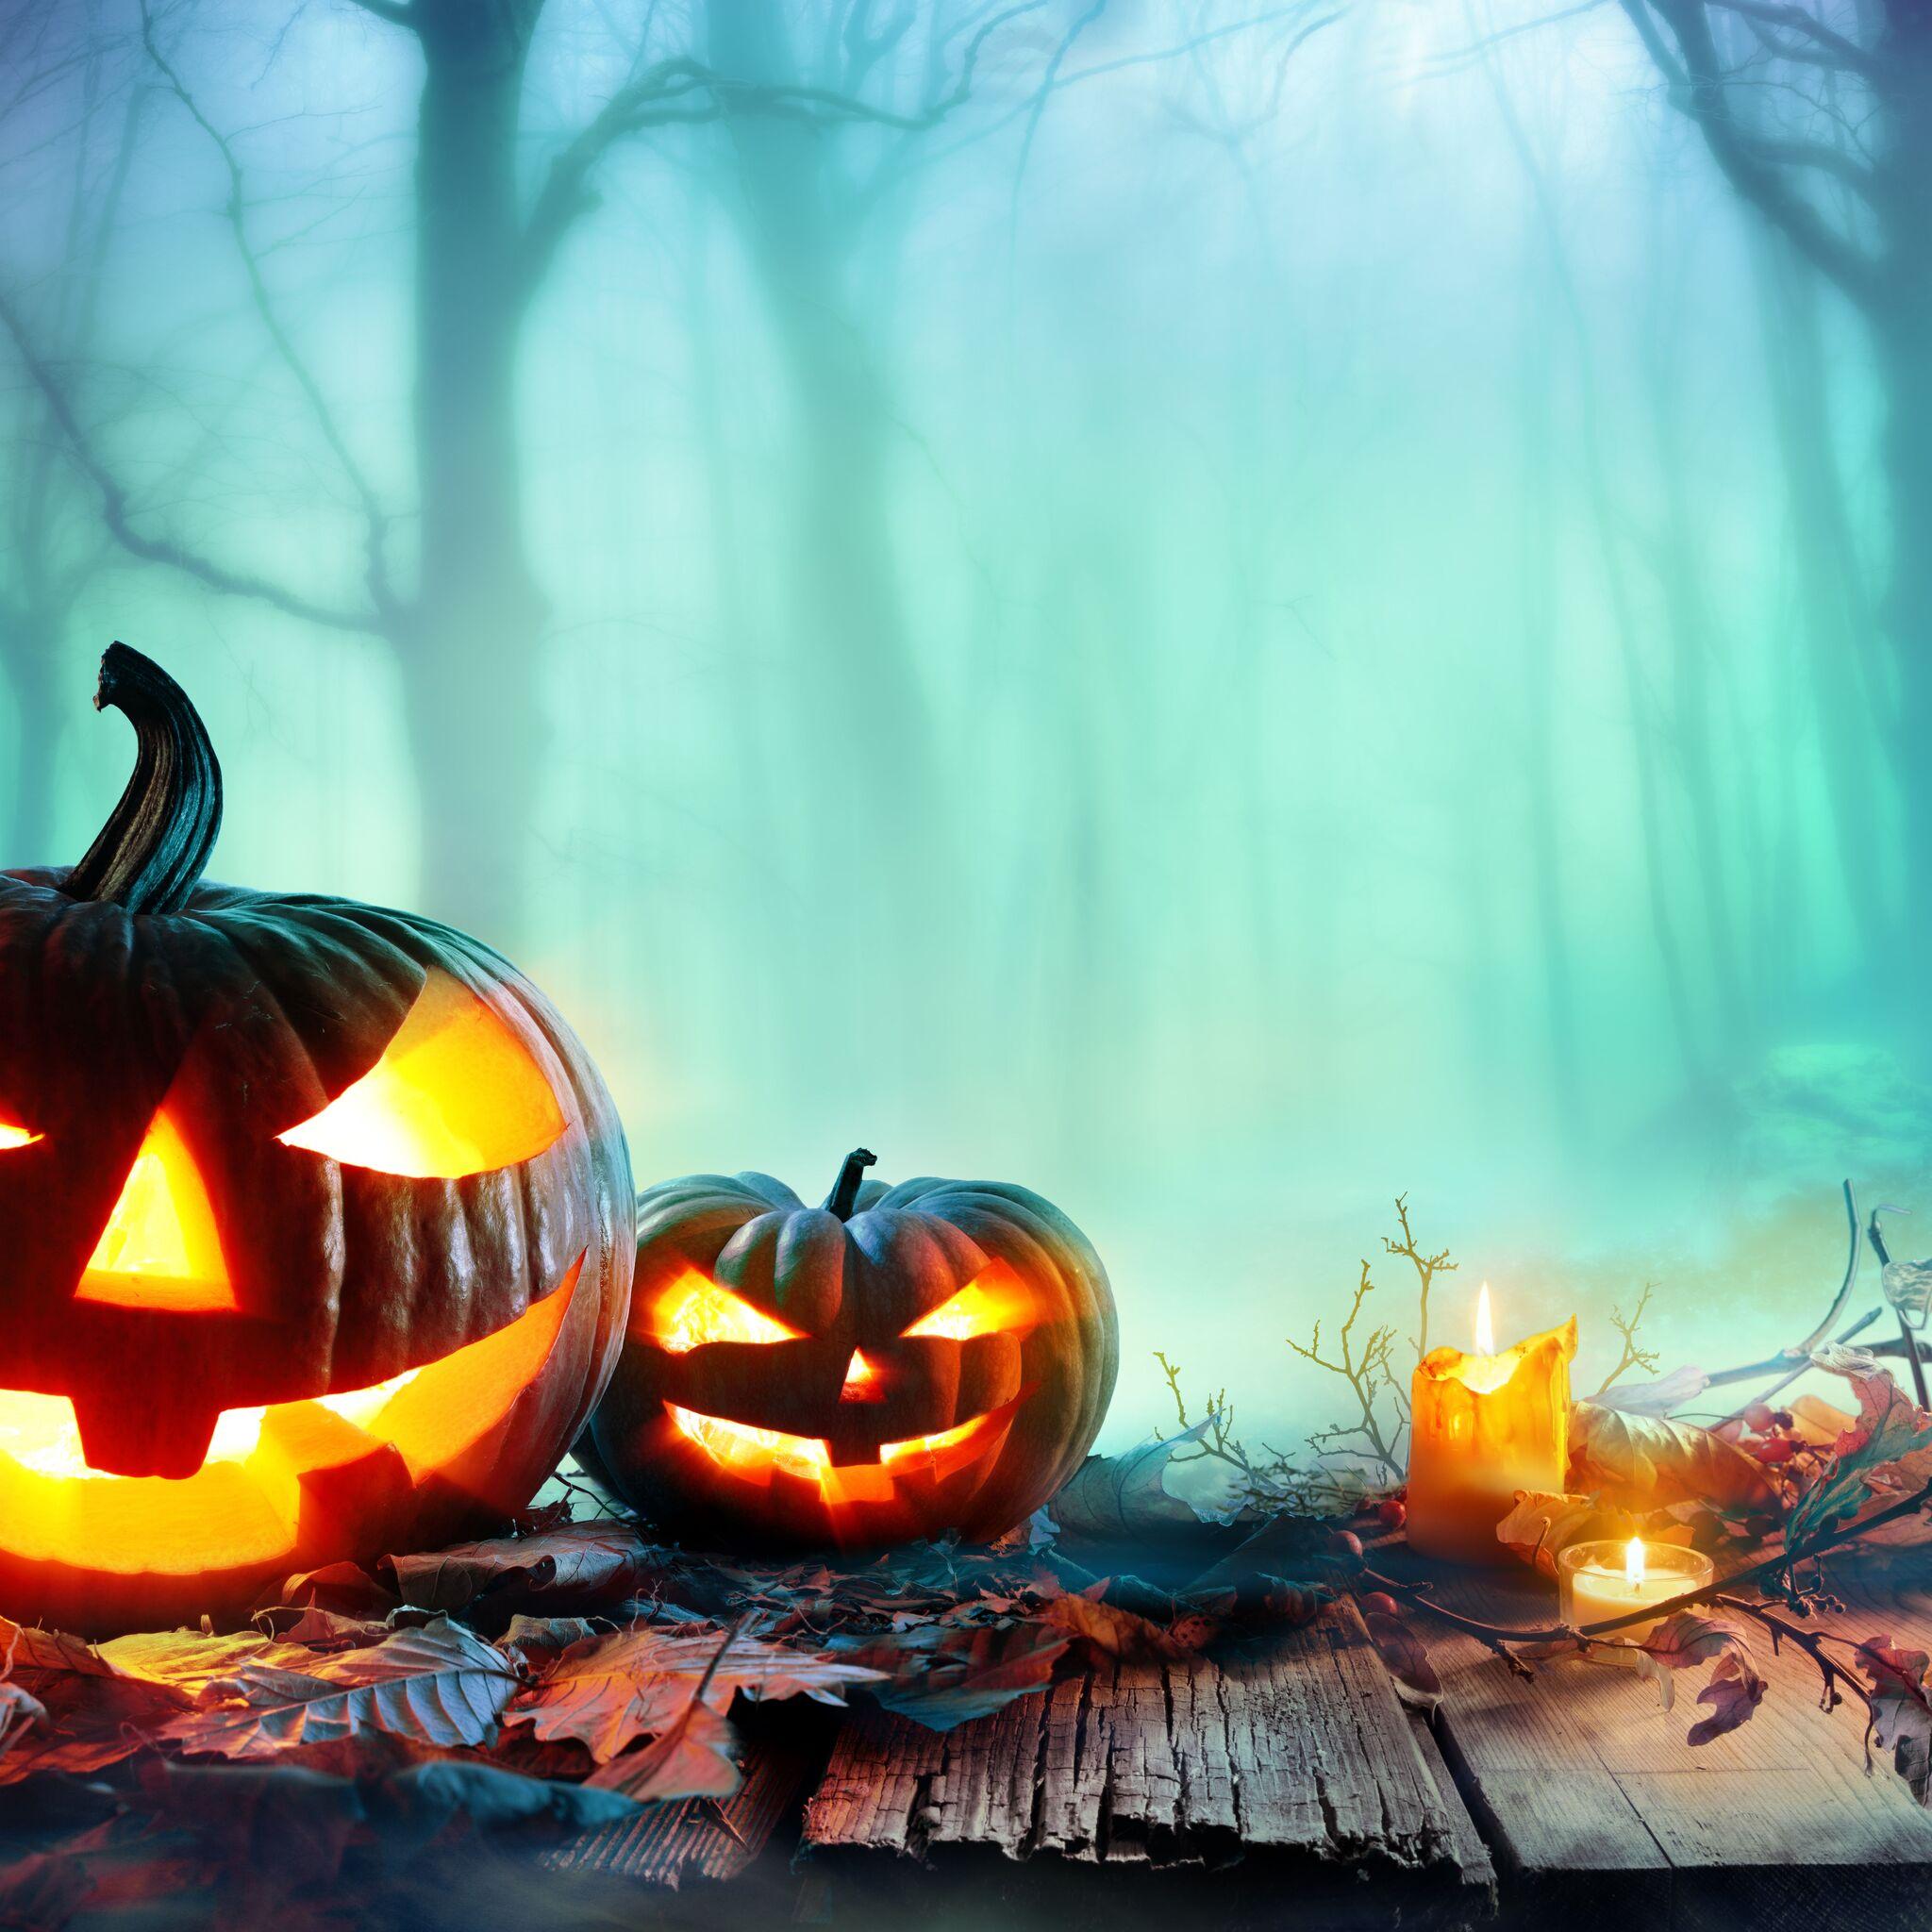 2048x2048 8k Halloween Ipad Air Hd 4k Wallpapers Images